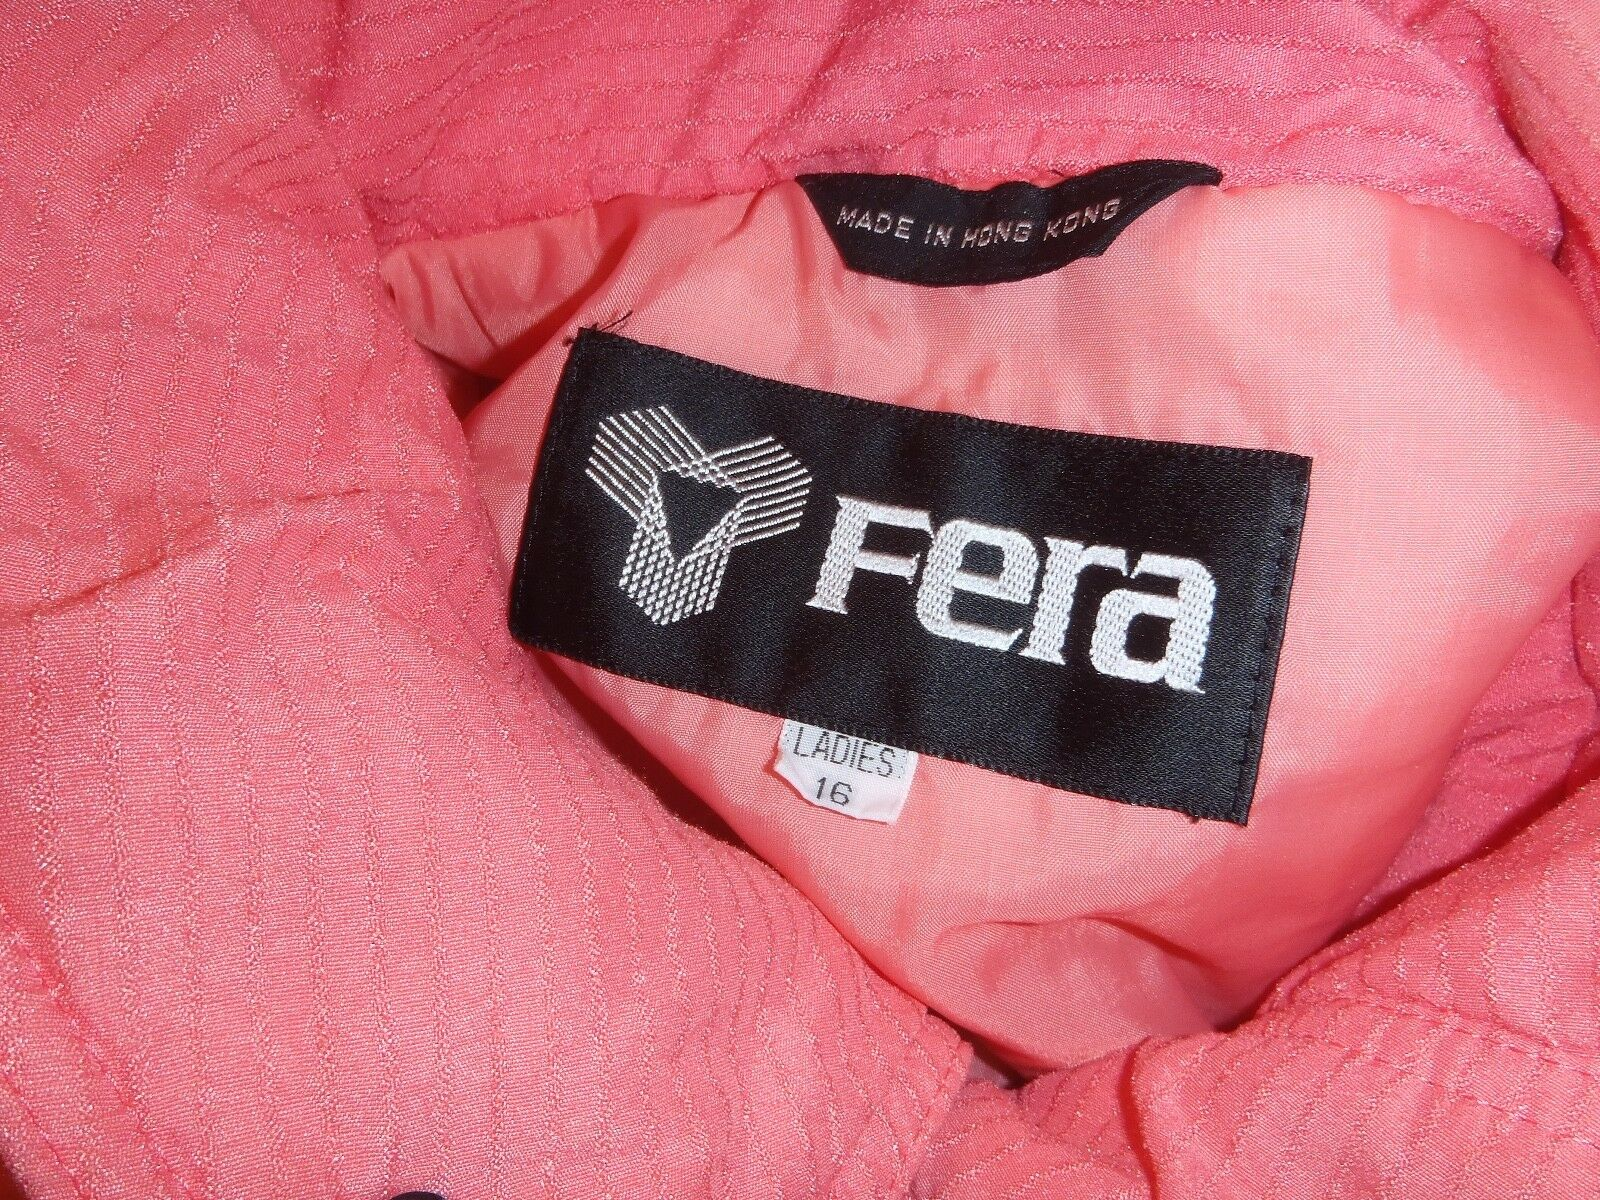 Damens's full length ski outfit Größe 16 by Fera